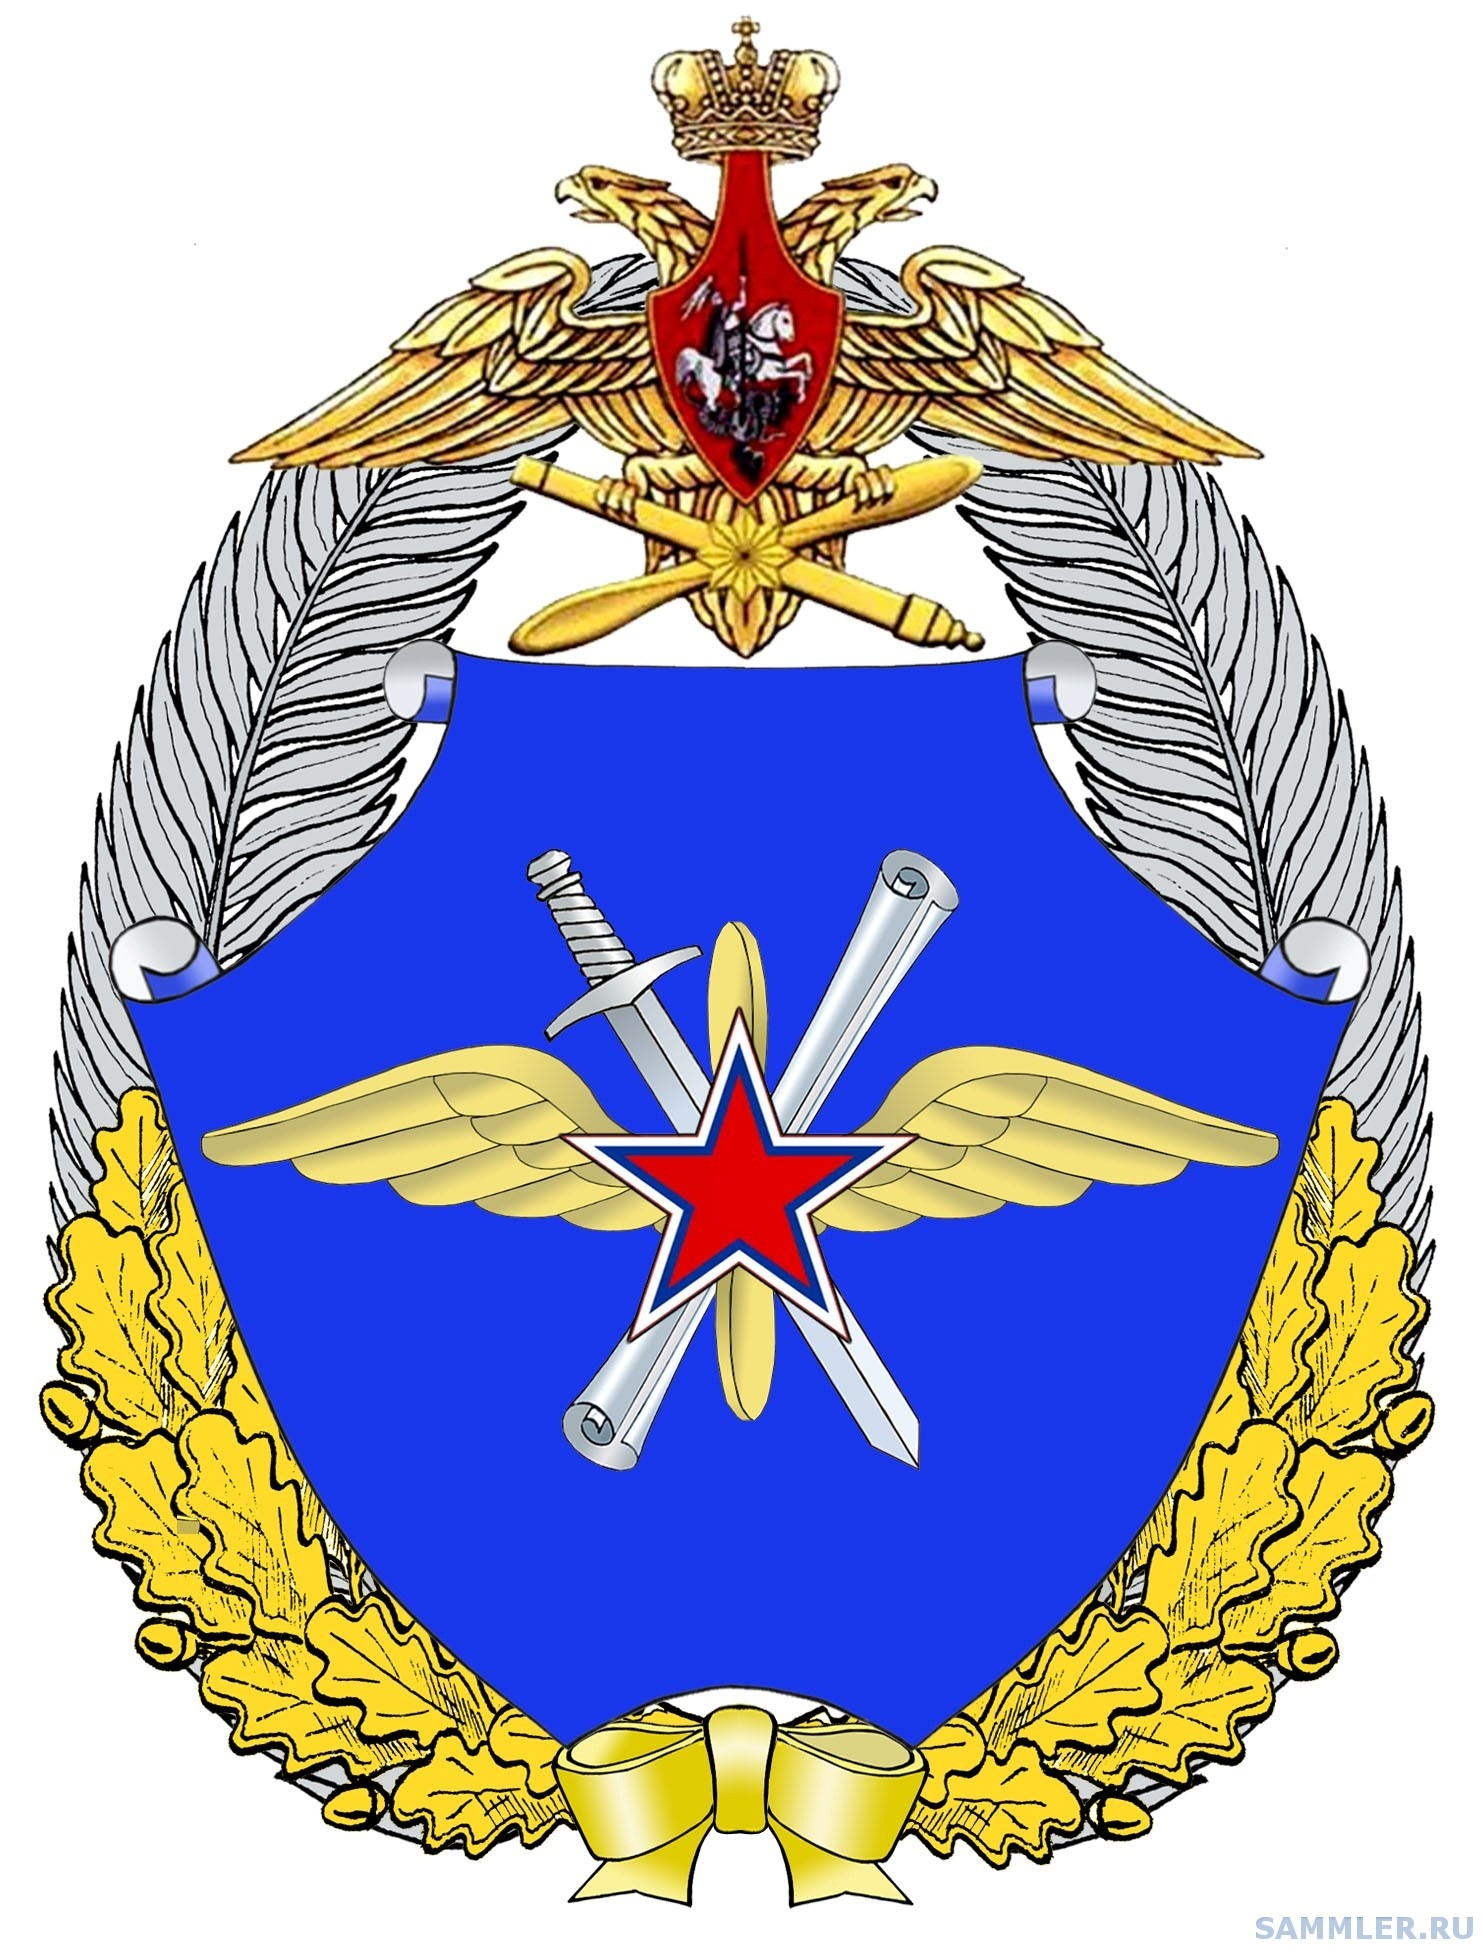 emblema-bolshaya-logotip-czm-vvs-novyj1.jpg